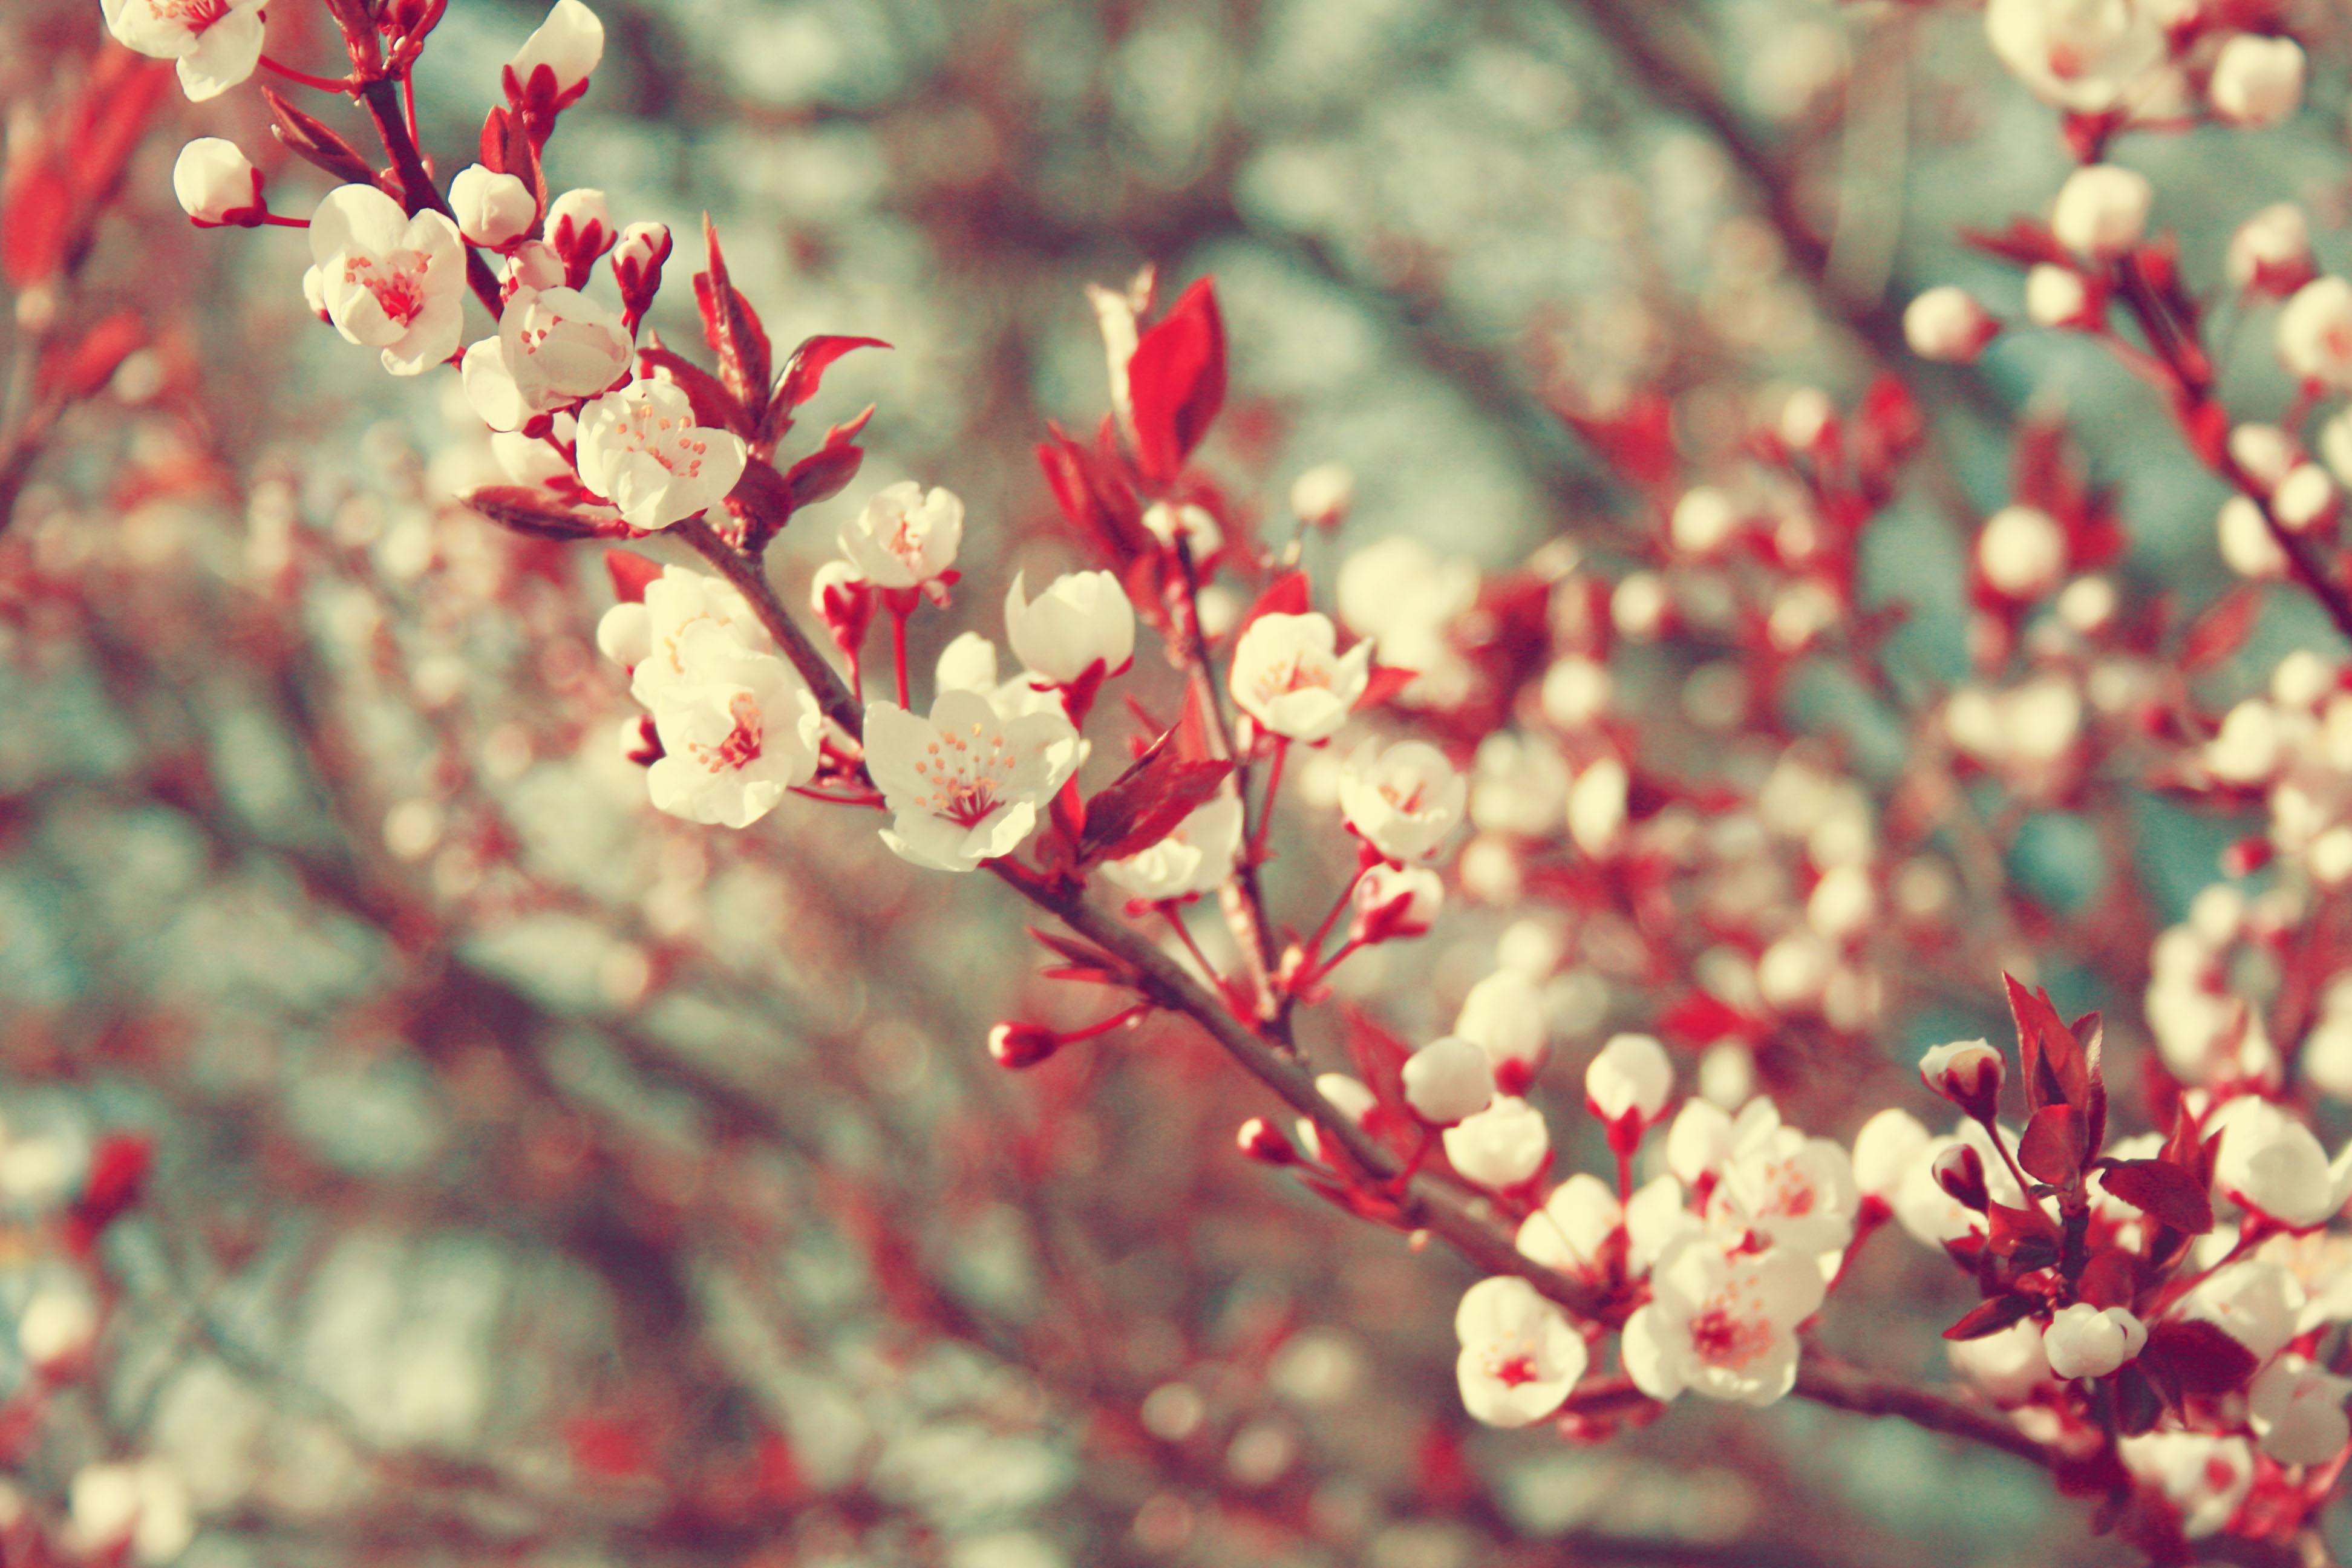 tumblr wallpaper photography - photo #36